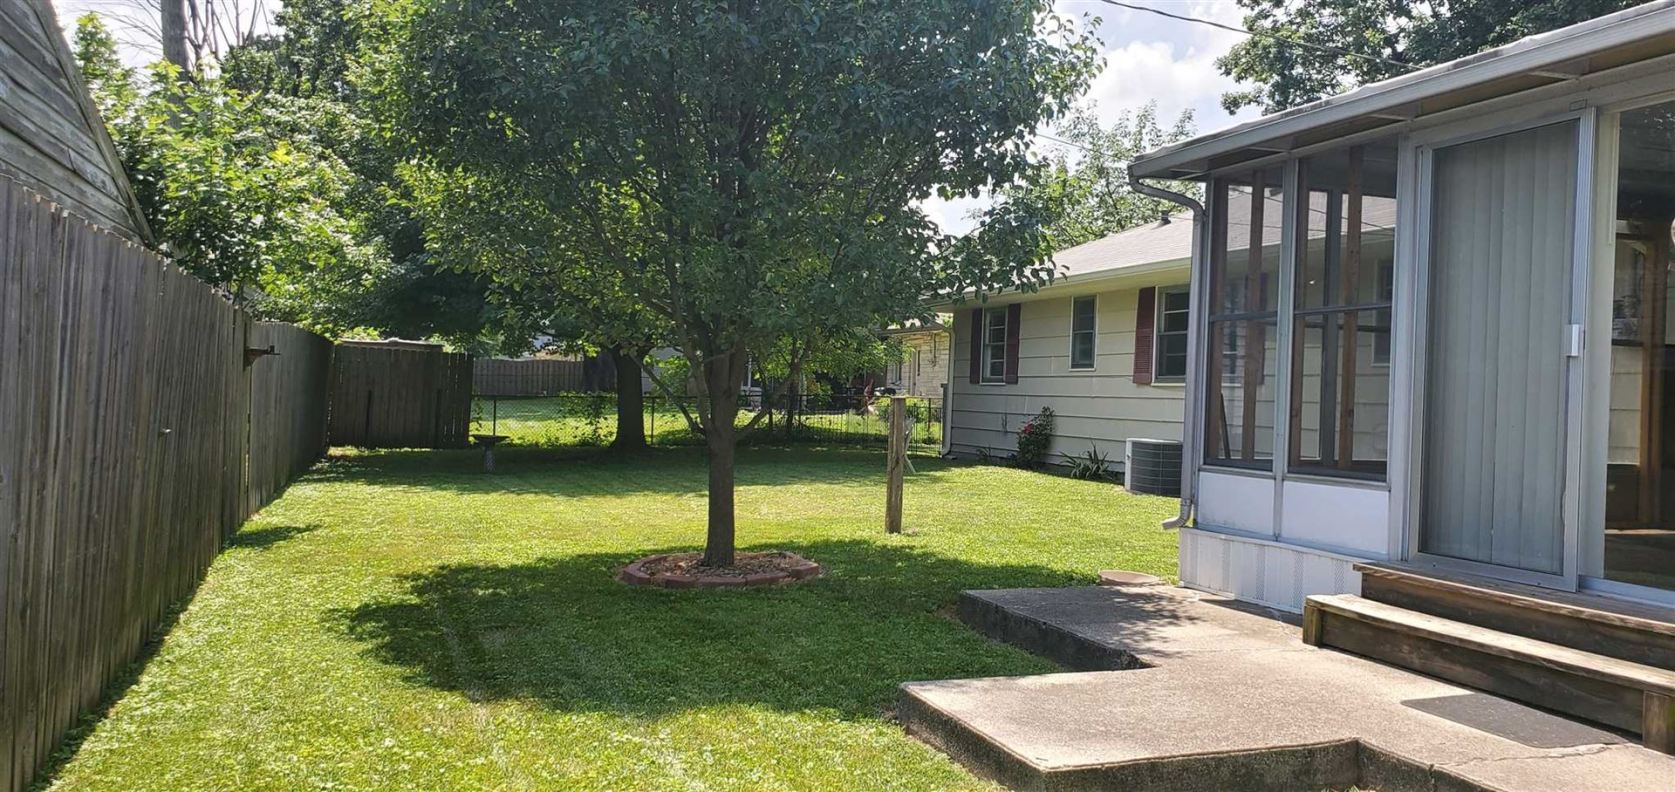 Photo of 124 E Westmoreland Drive, Kokomo, IN 46901 (MLS # 202026852)